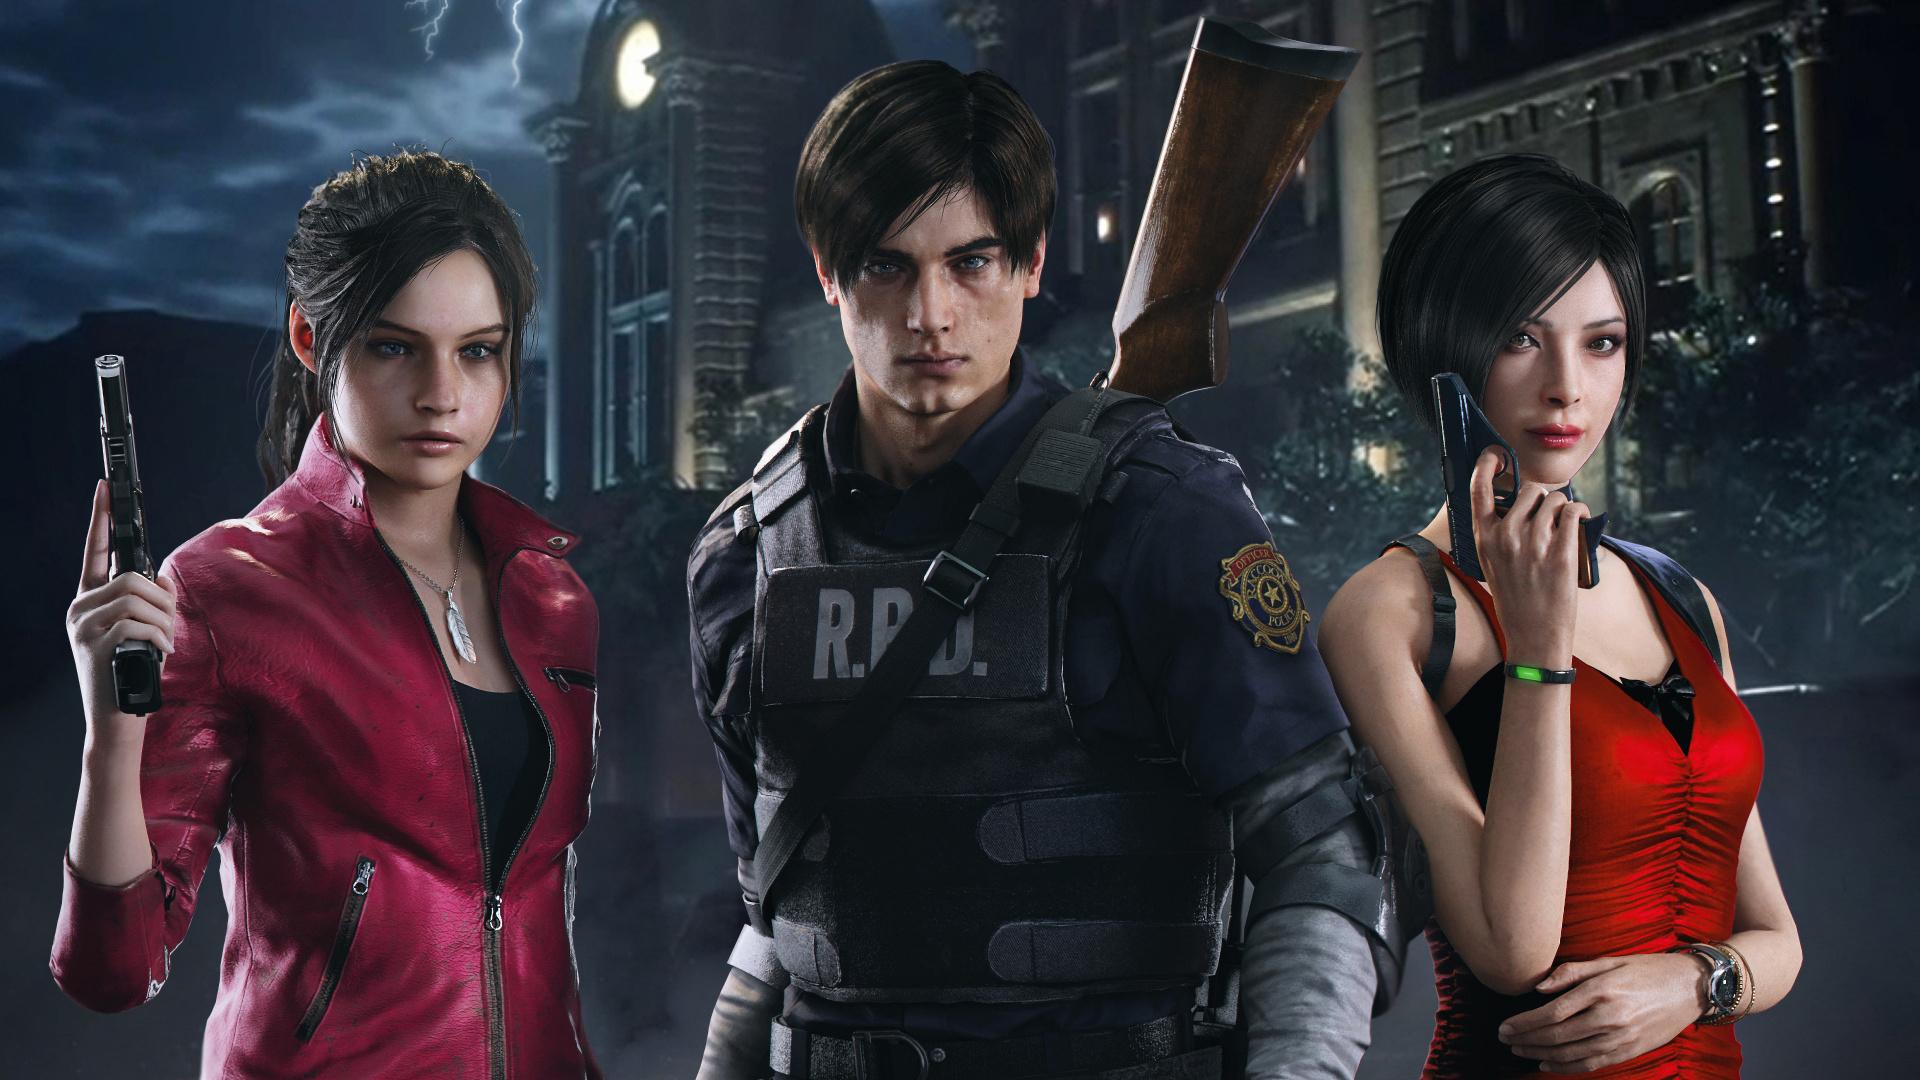 Фильм Resident Evil: Welcome to Raccoon City переехал на ноябрь